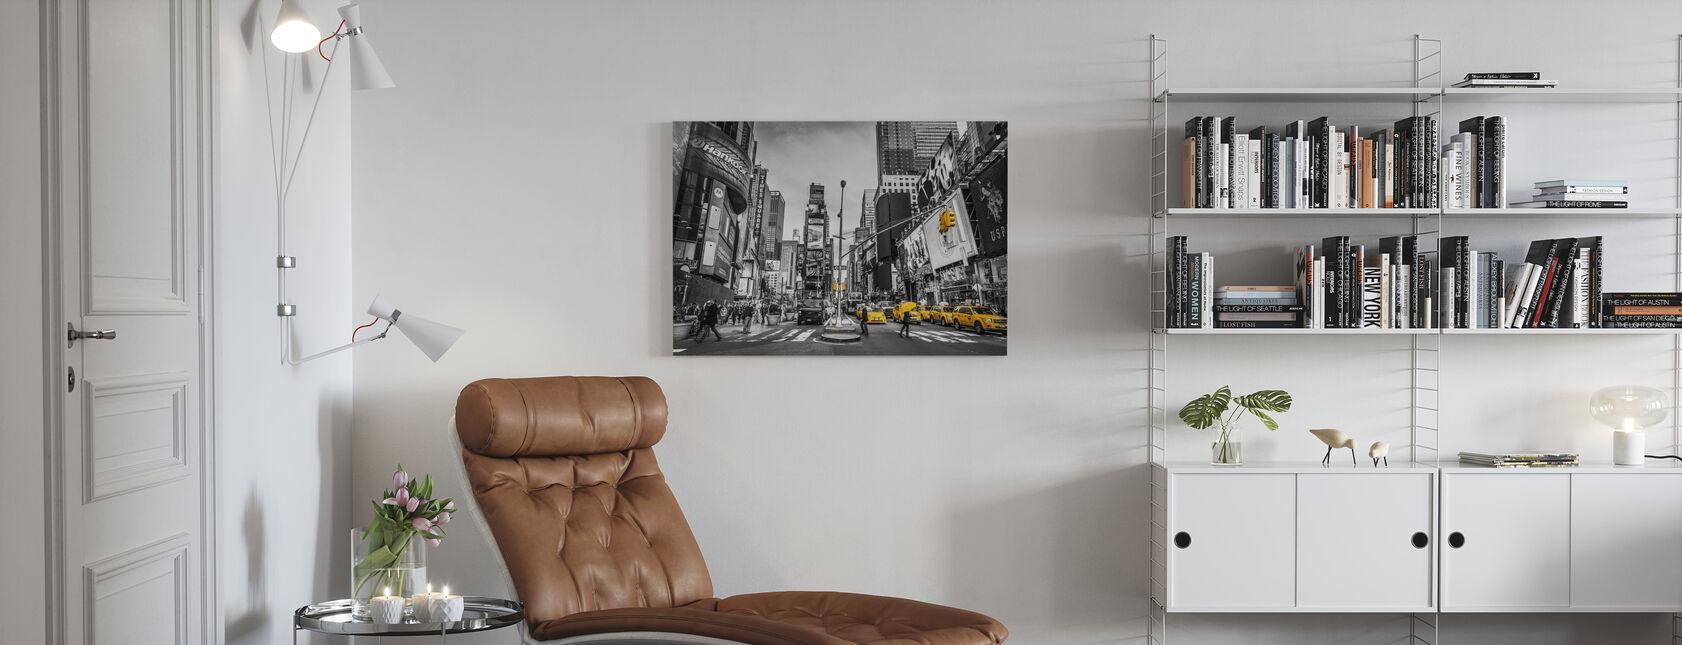 New York City Cabs - Canvas print - Living Room